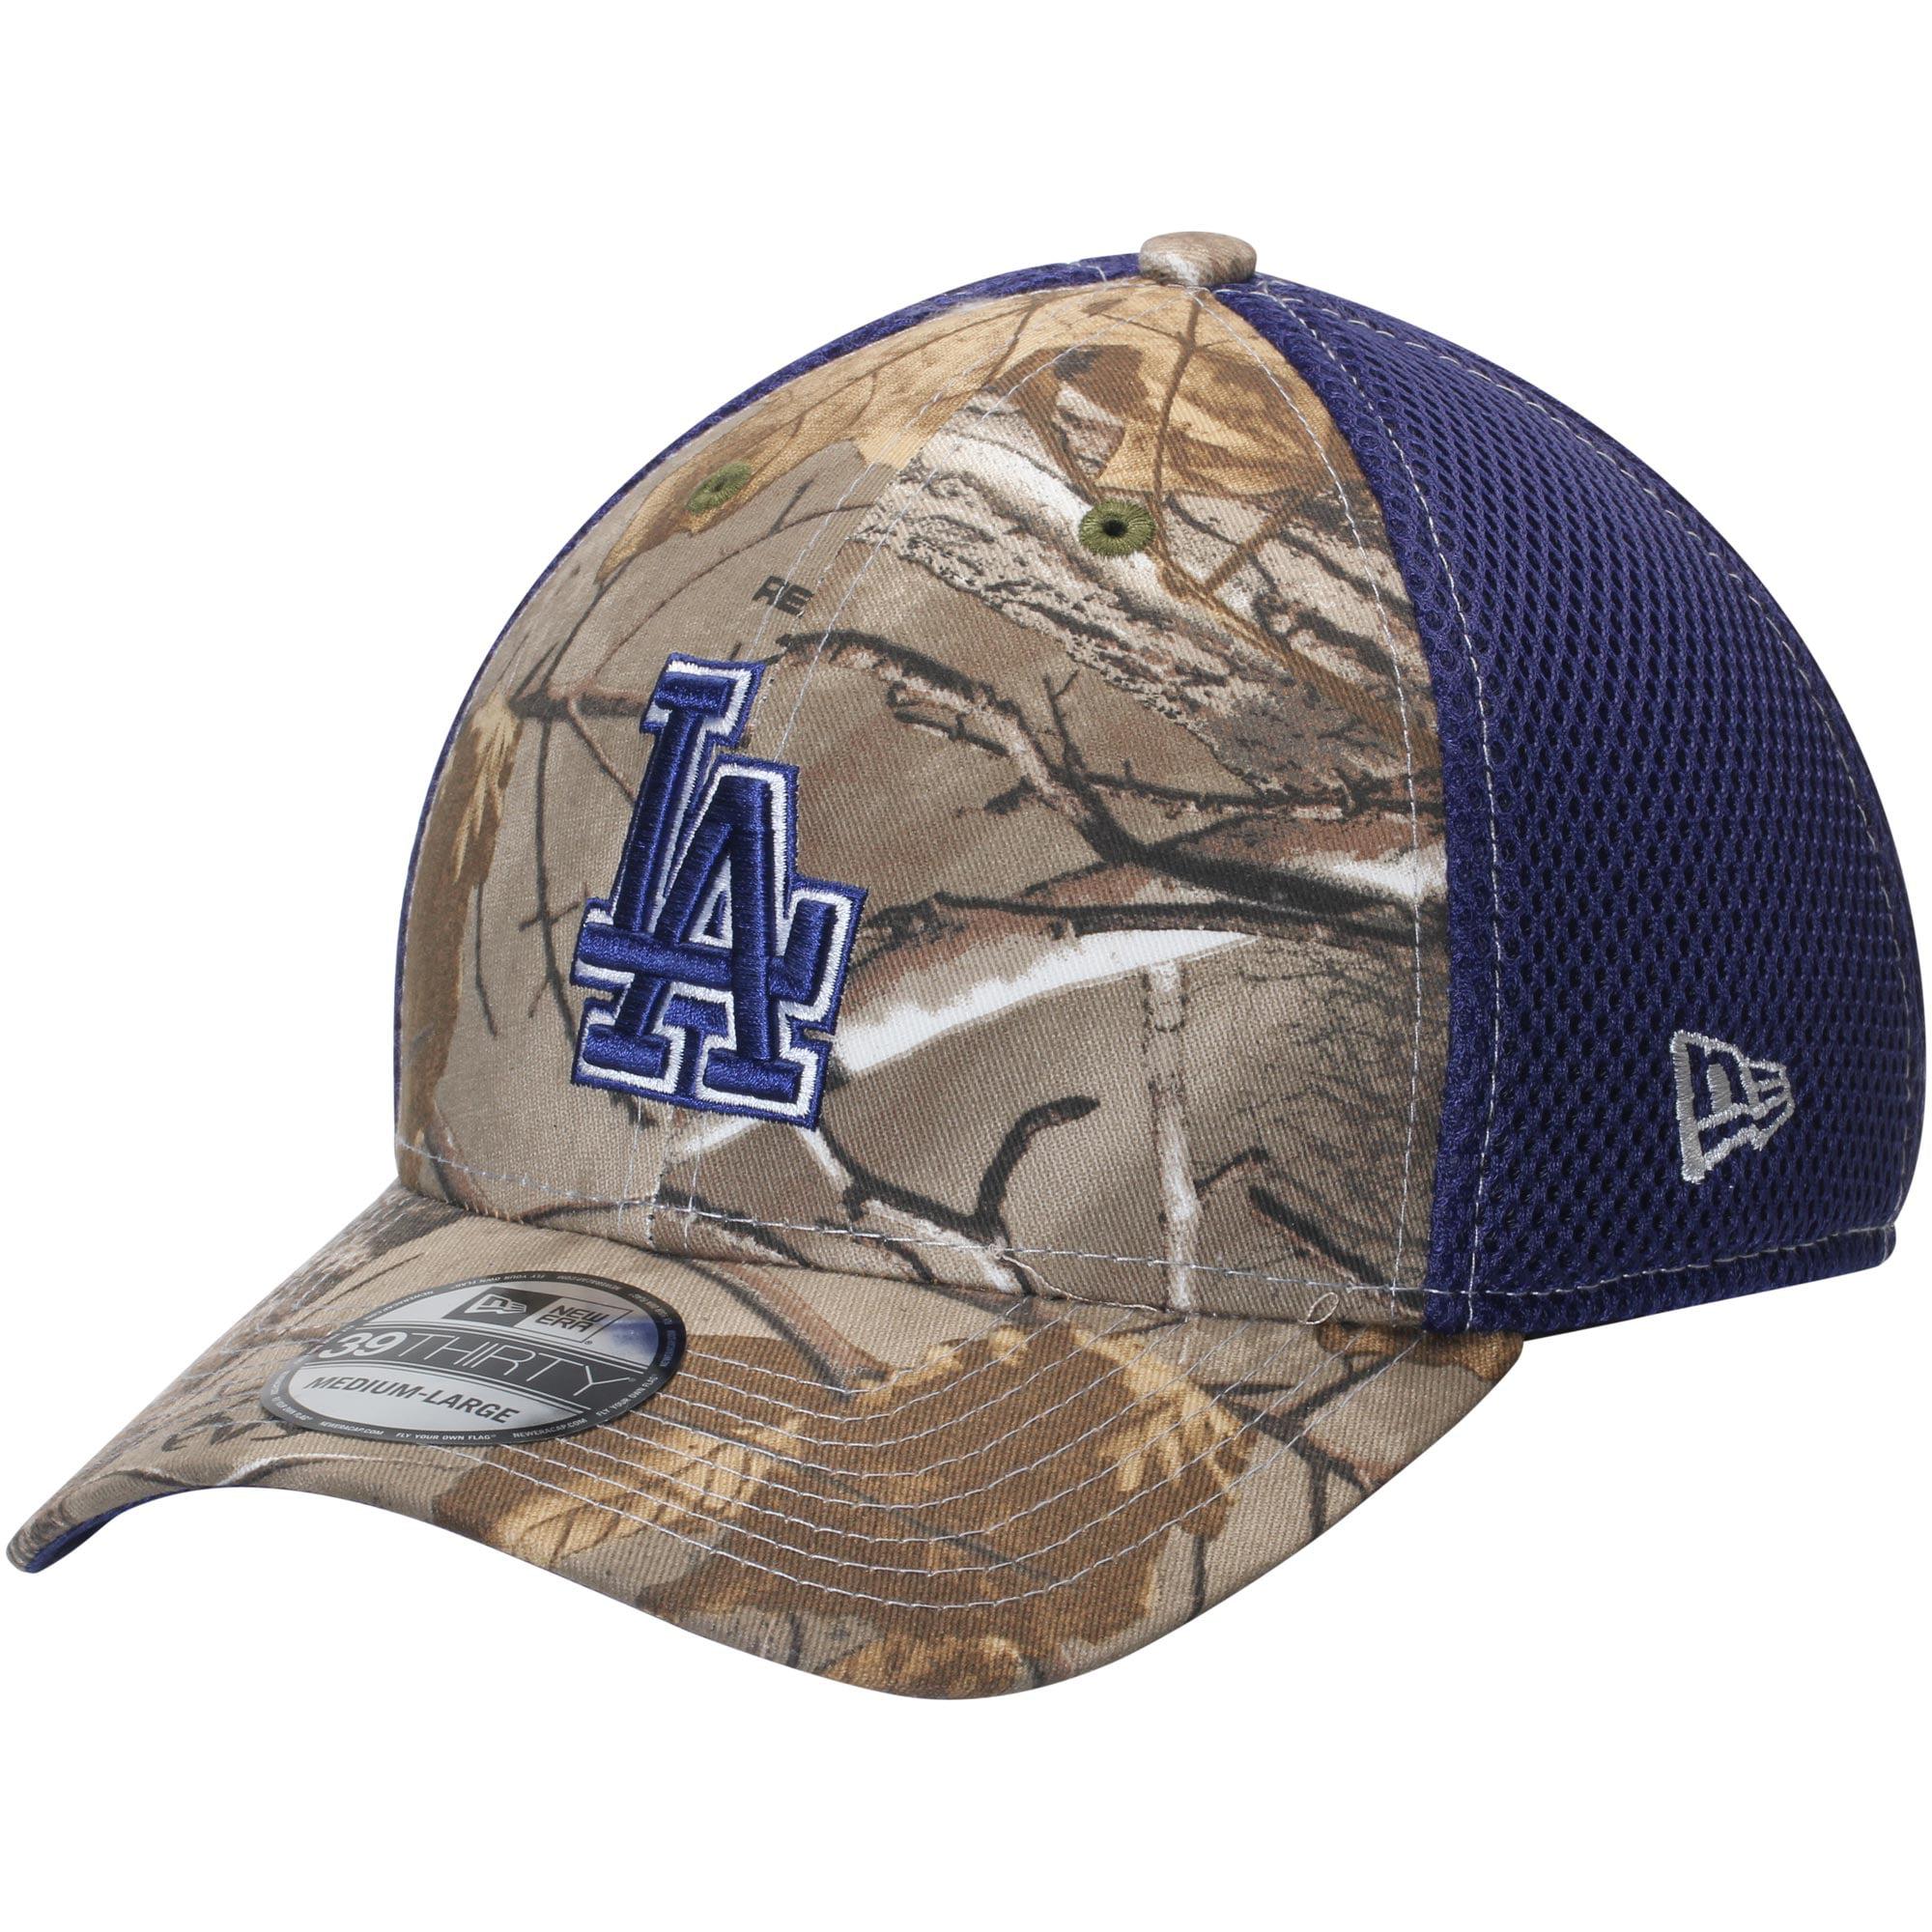 Los Angeles Dodgers New Era Neo 39THIRTY Flex Hat - Realtree Camo